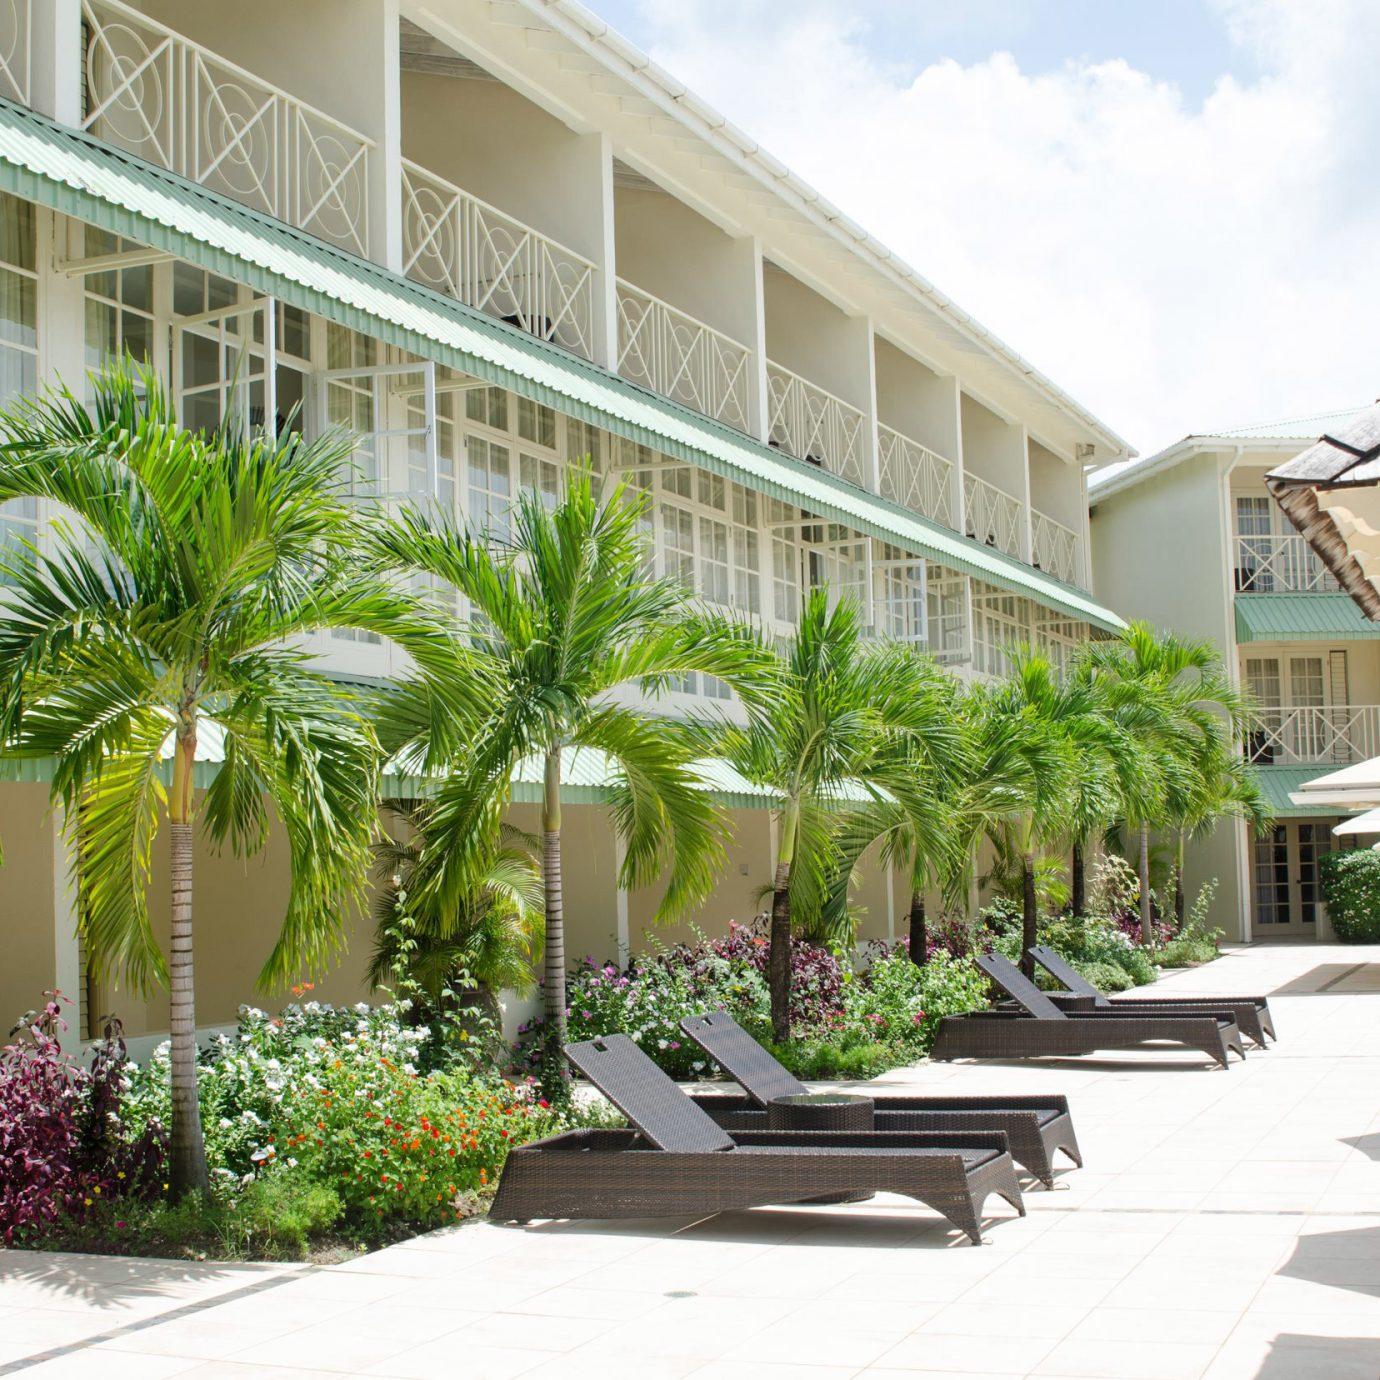 sky building condominium property Resort Courtyard plaza home residential area plant Villa walkway outdoor structure porch